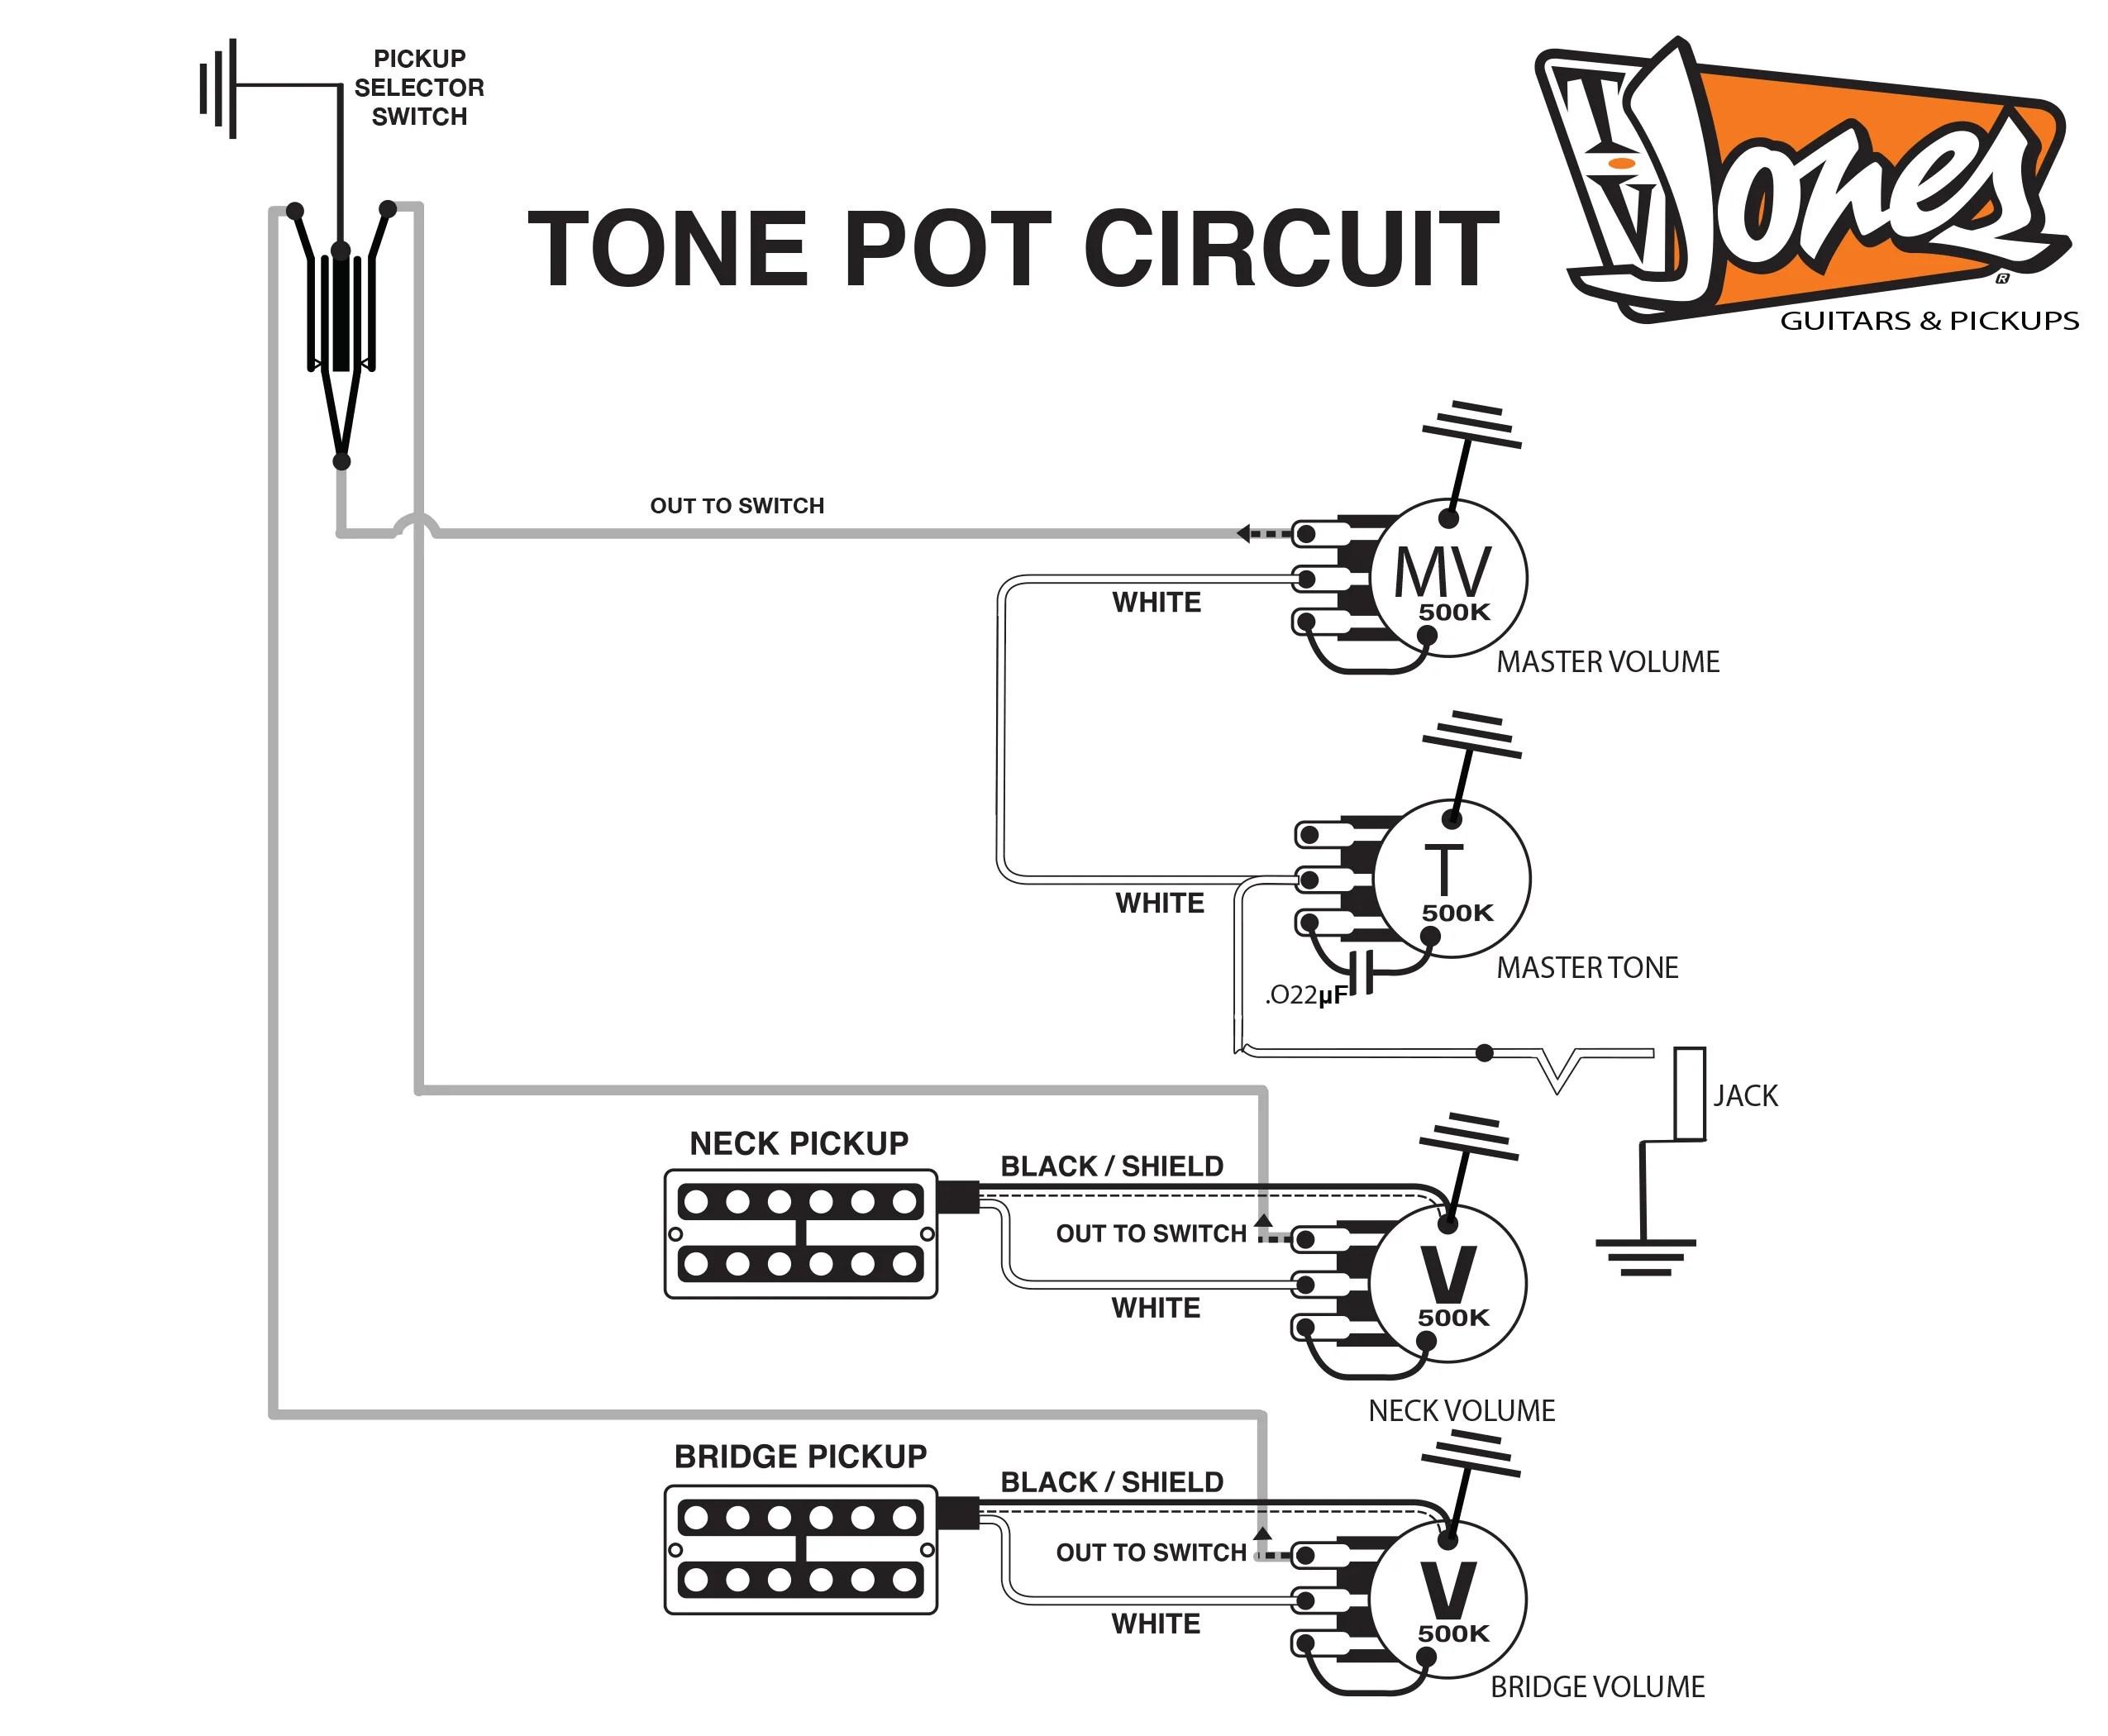 GRETSCH 5120 WIRING DIAGRAM  Auto Electrical Wiring Diagram